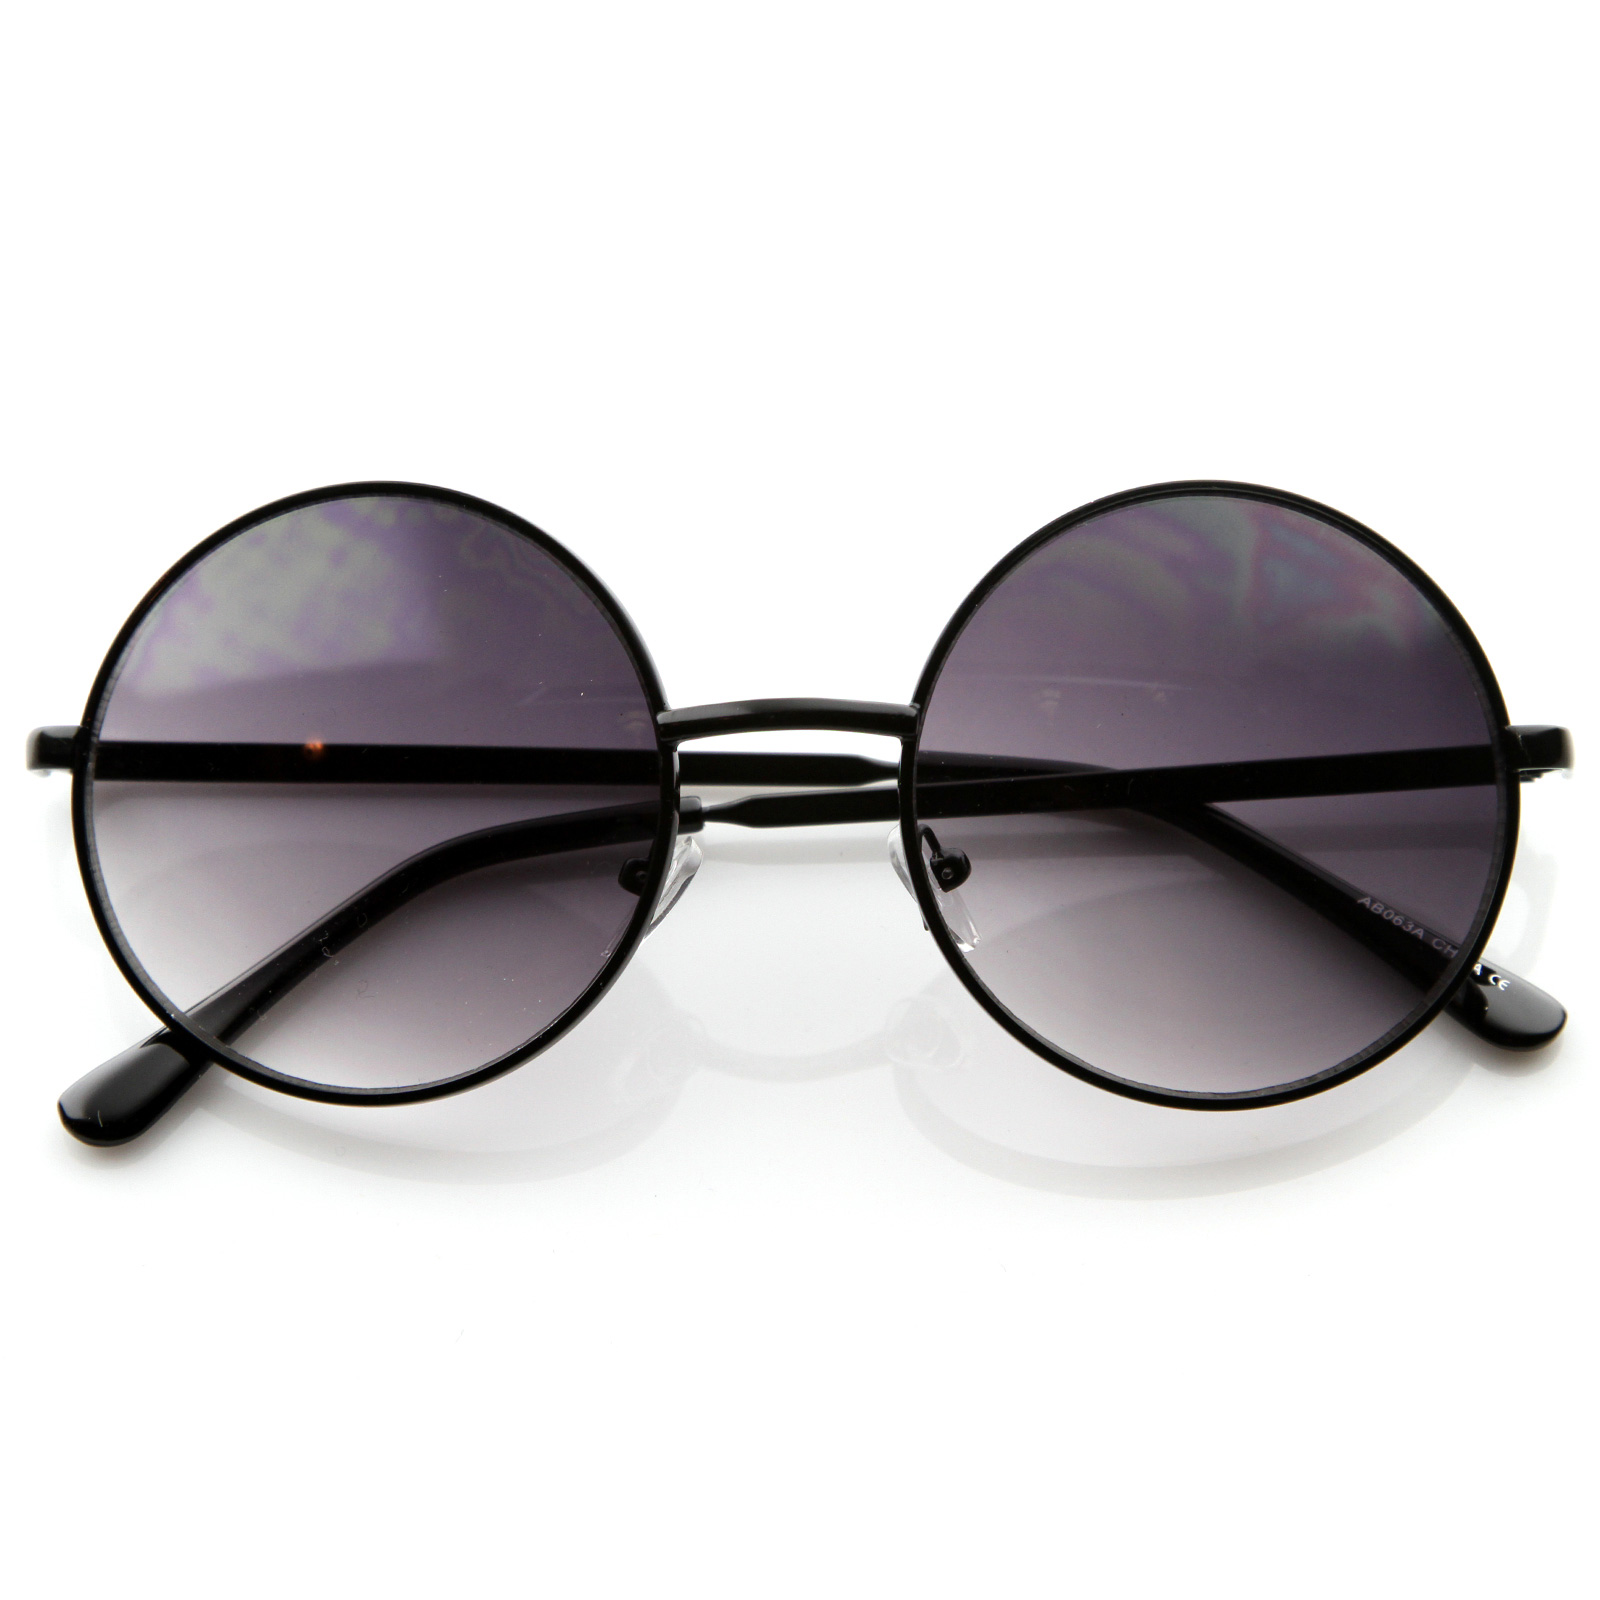 New-Designer-Fashion-Medium-Size-Full-Metal-Round-Circle-Womens-Sunglasses-8570